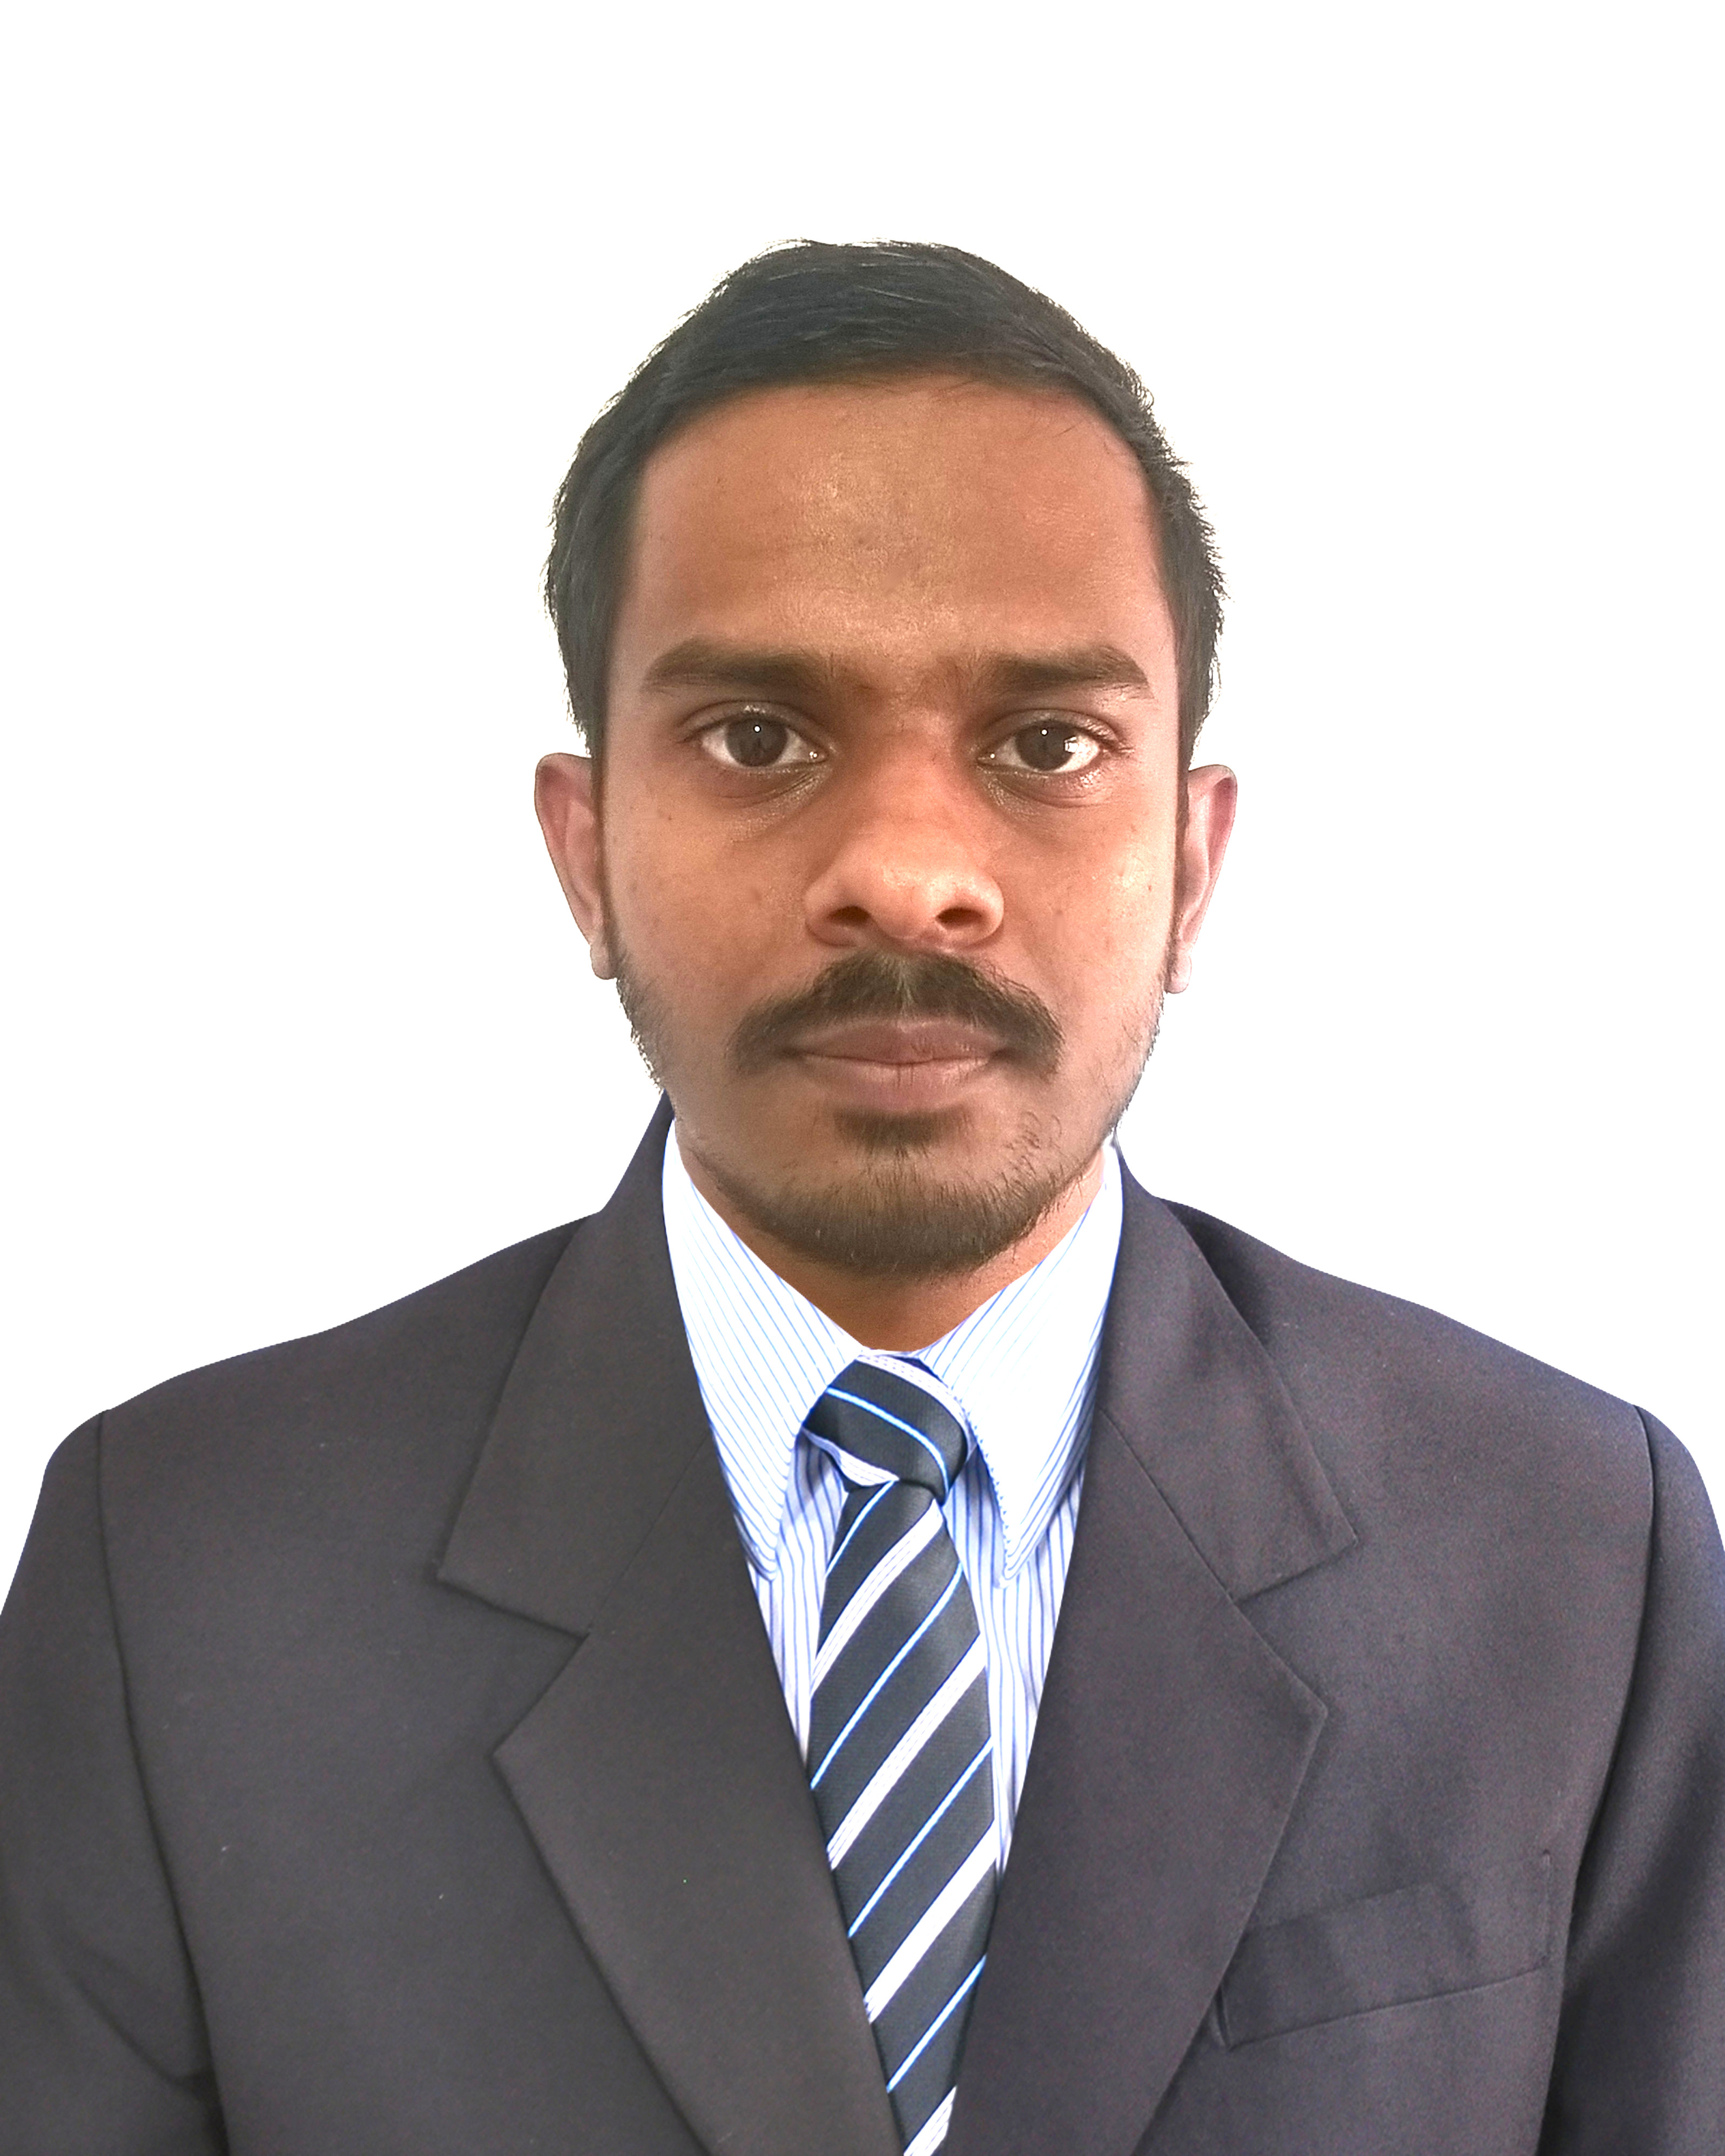 Dr Chathuranga Hettiarachchi